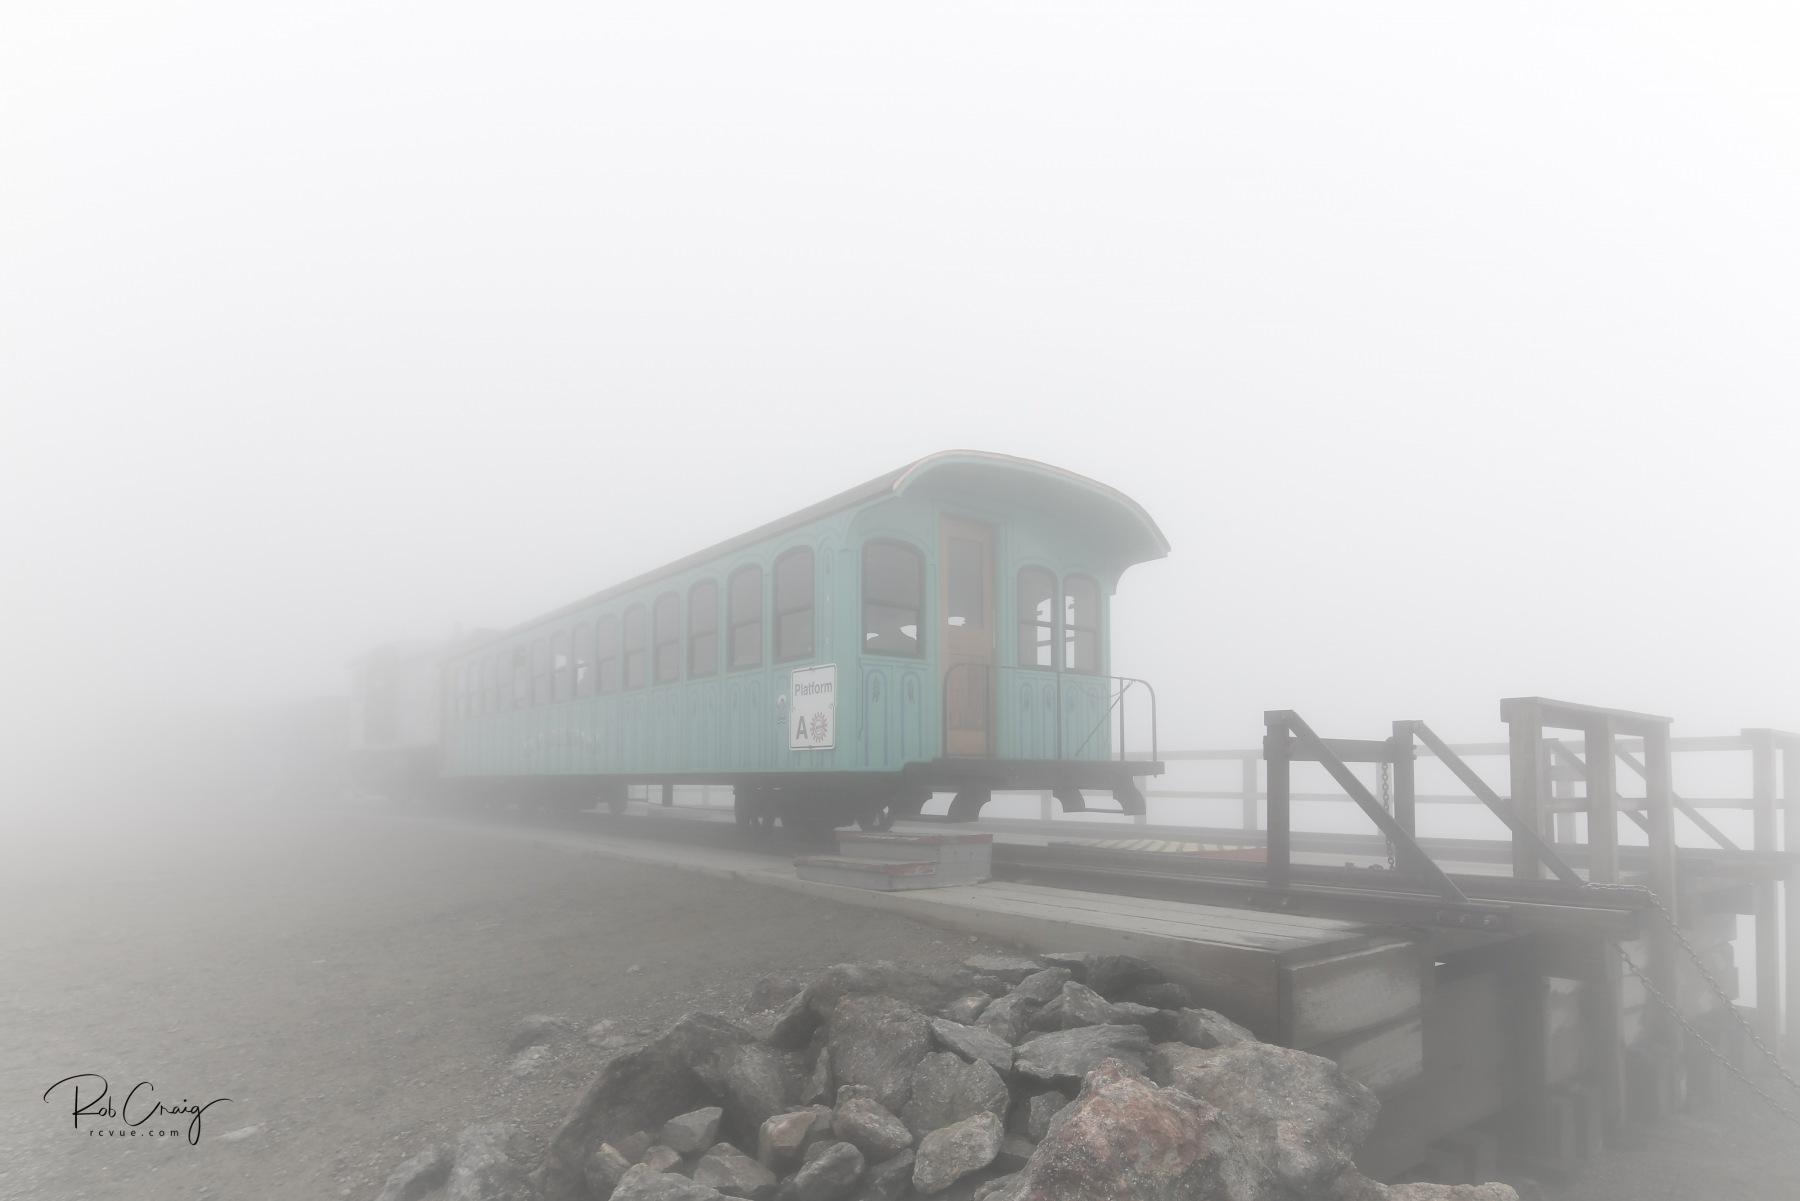 Cog Railway 100520.jpg